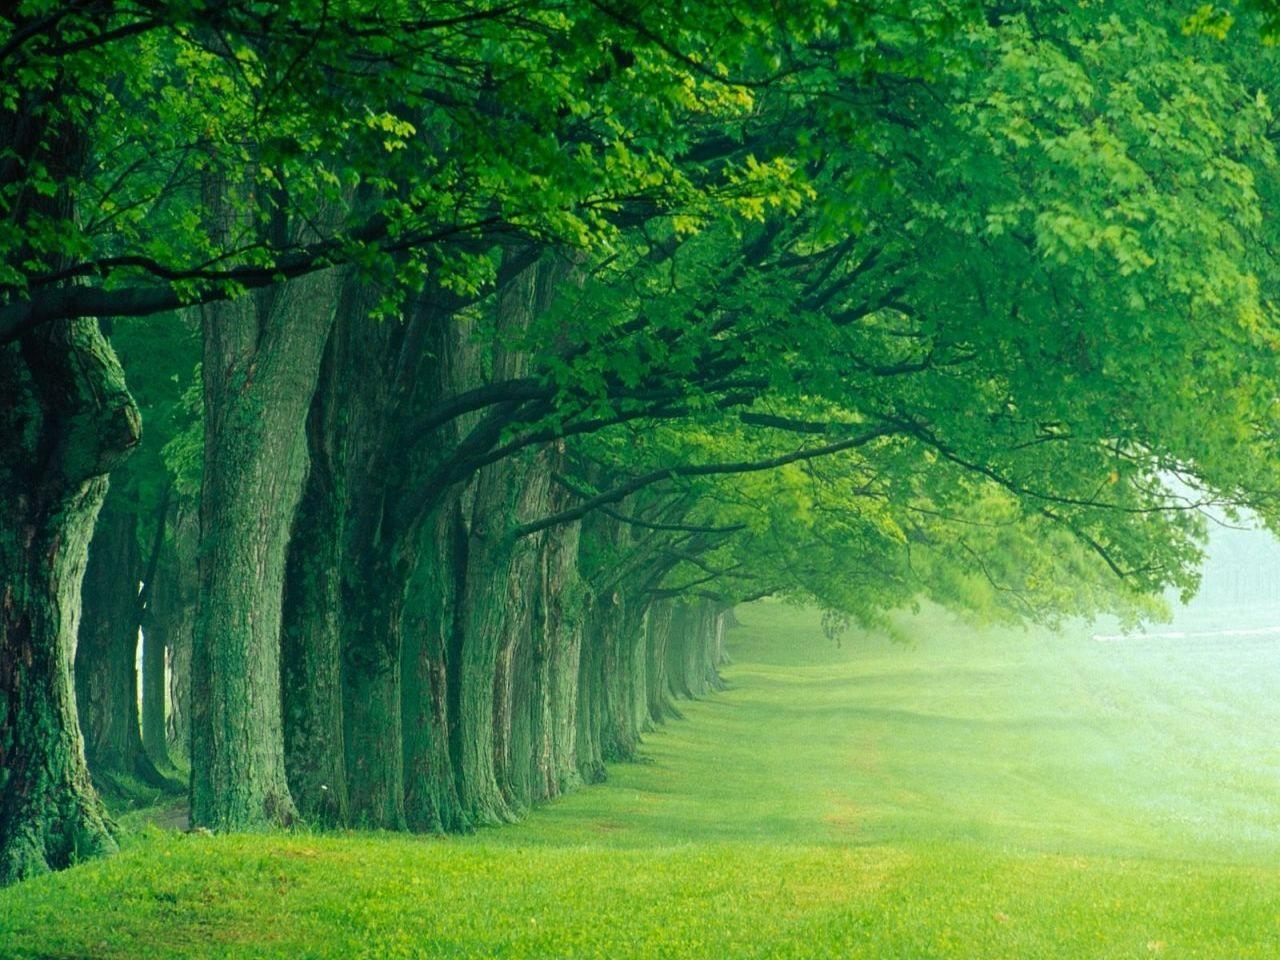 imagenes de naturaleza para fondo de pantalla en hd gratis